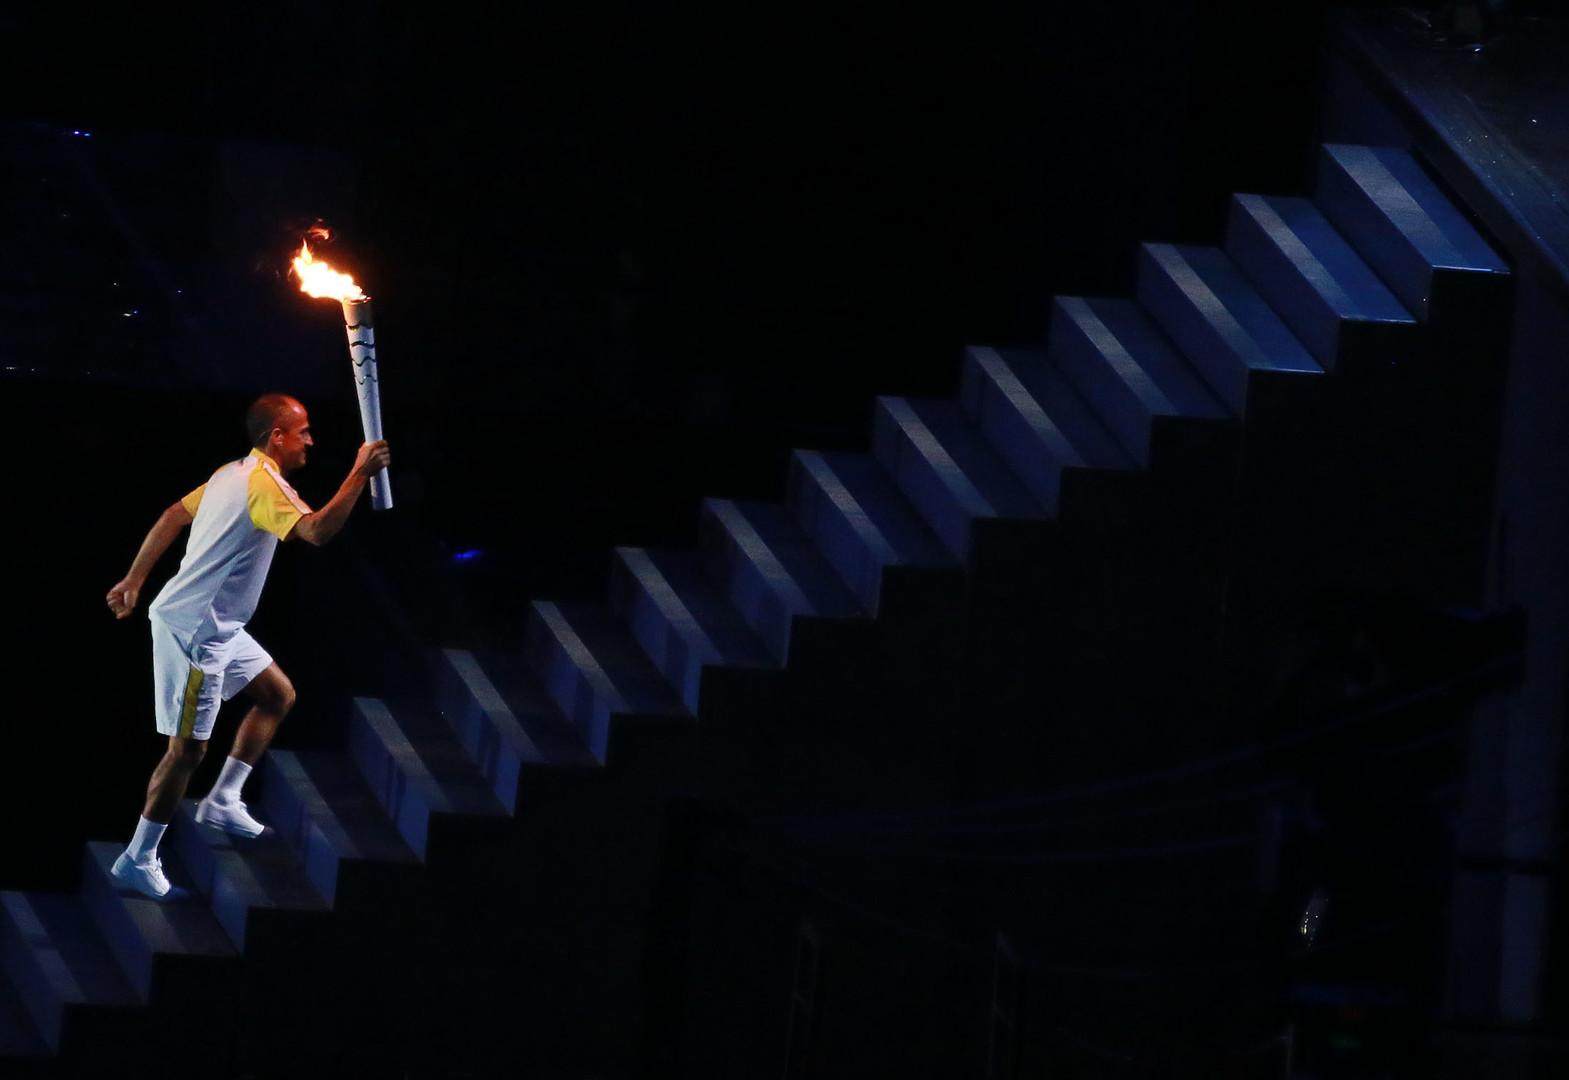 Олимпиада в Рио.  Хроника событий.